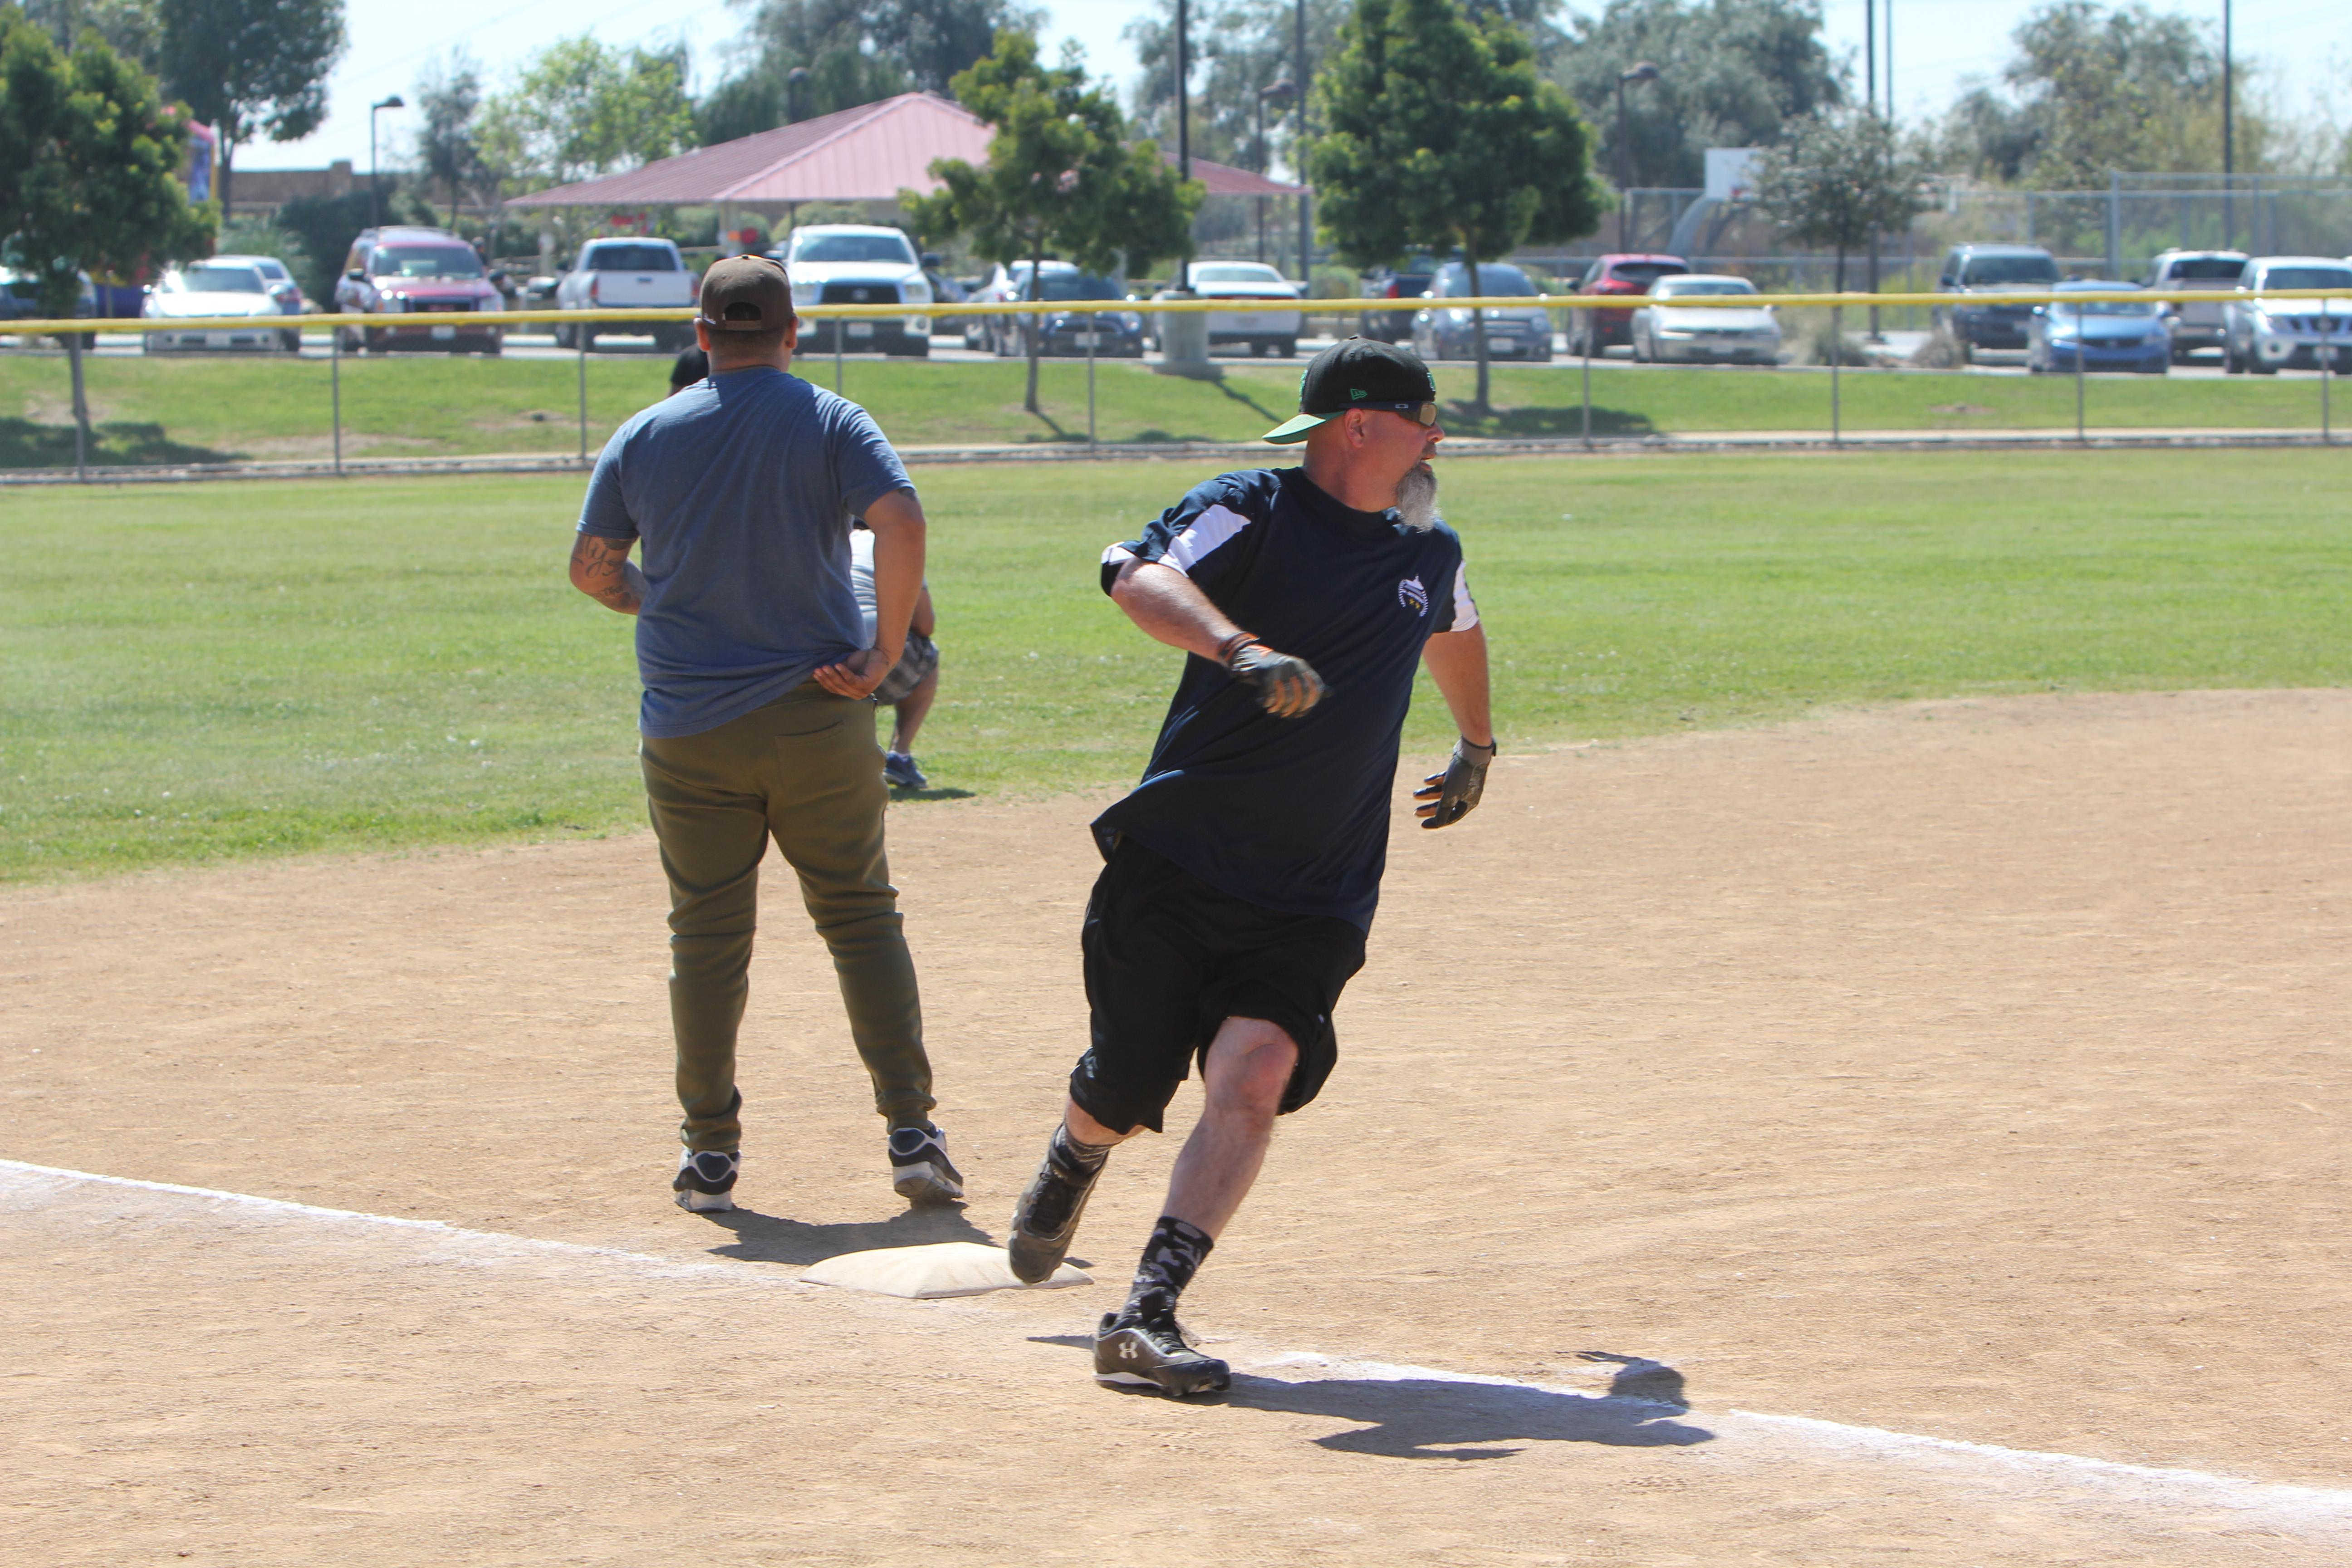 03-11-17 SIGNs Softball (35)